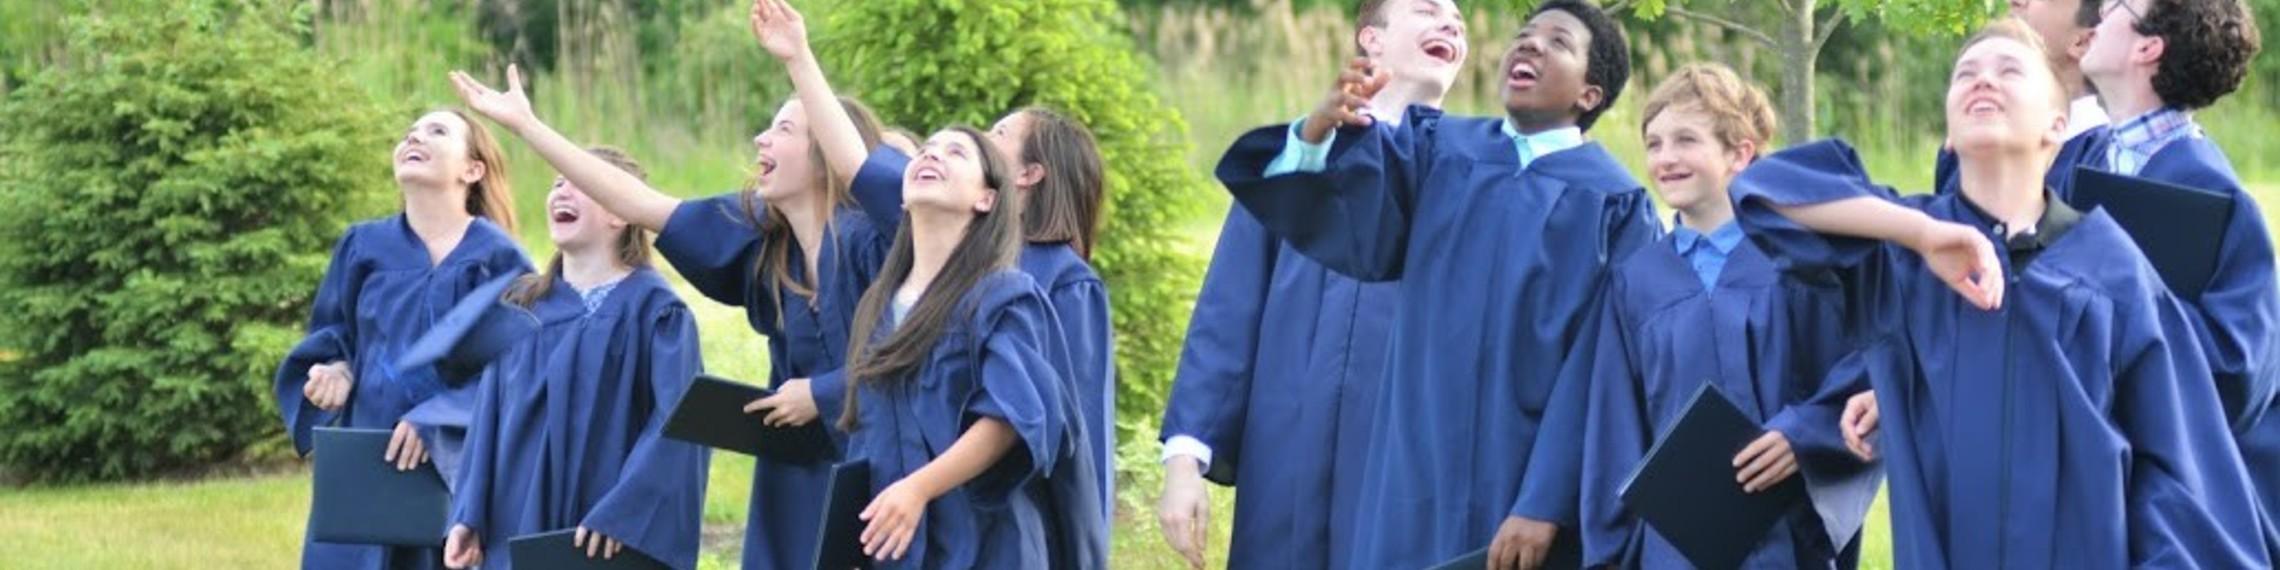 200603 Graduation Class Of 2020 40